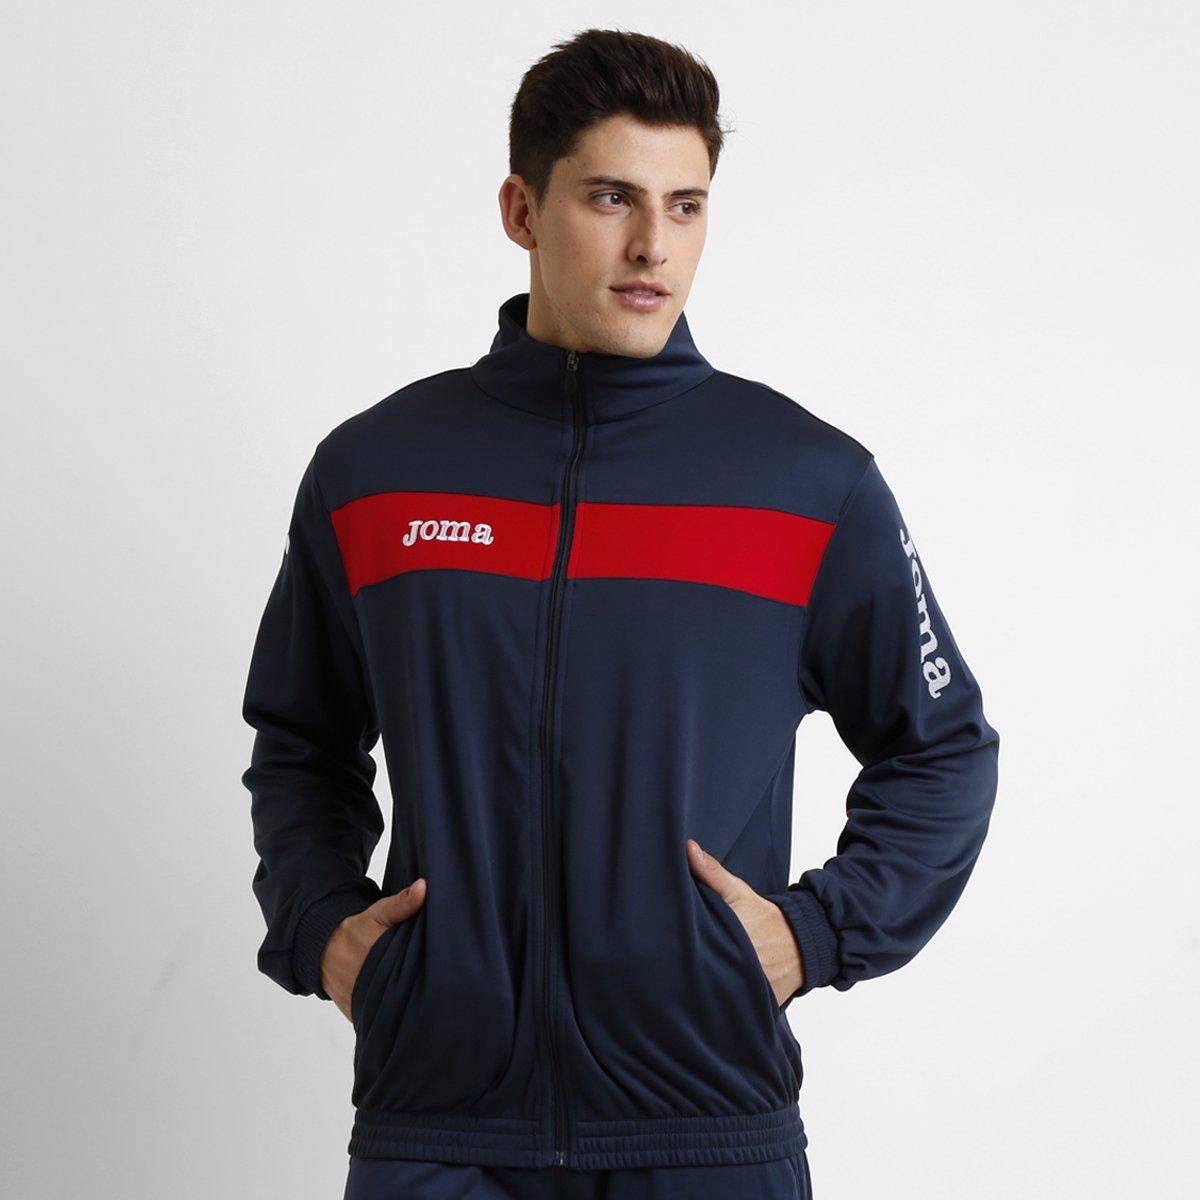 03d386e7c7 Jaqueta Joma Academy - Compre Agora